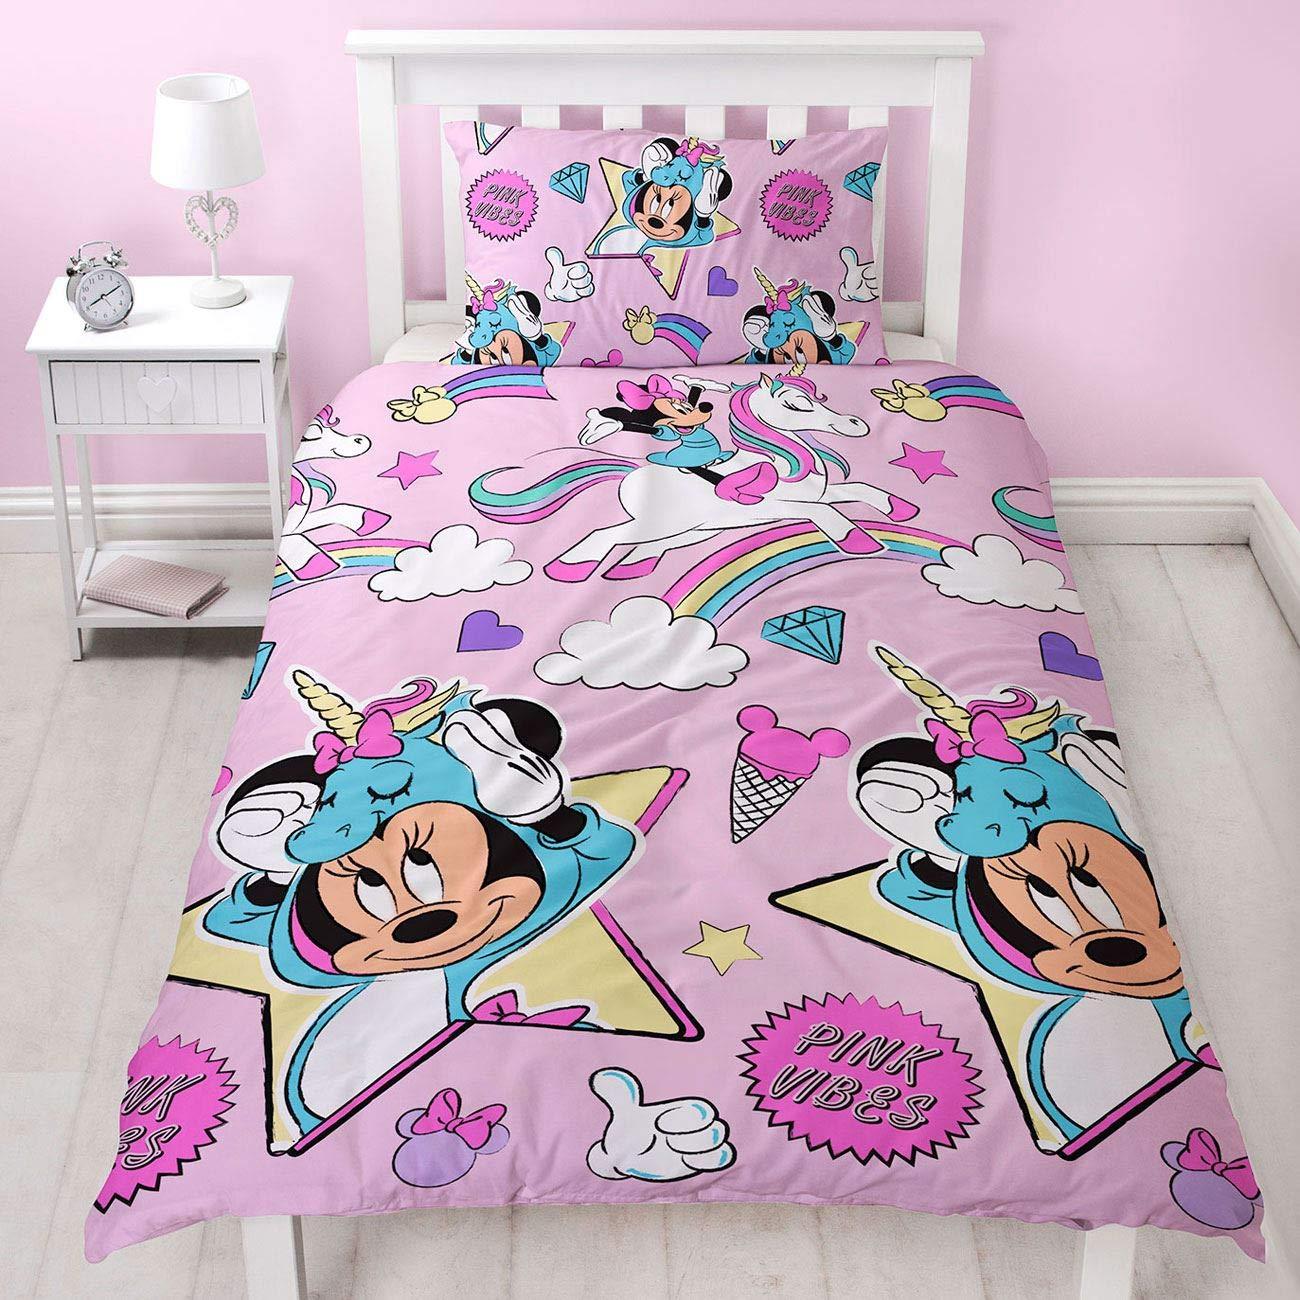 Minnie Mouse Unicorns Single / Twin Duvet Cover and Pillowcase Set